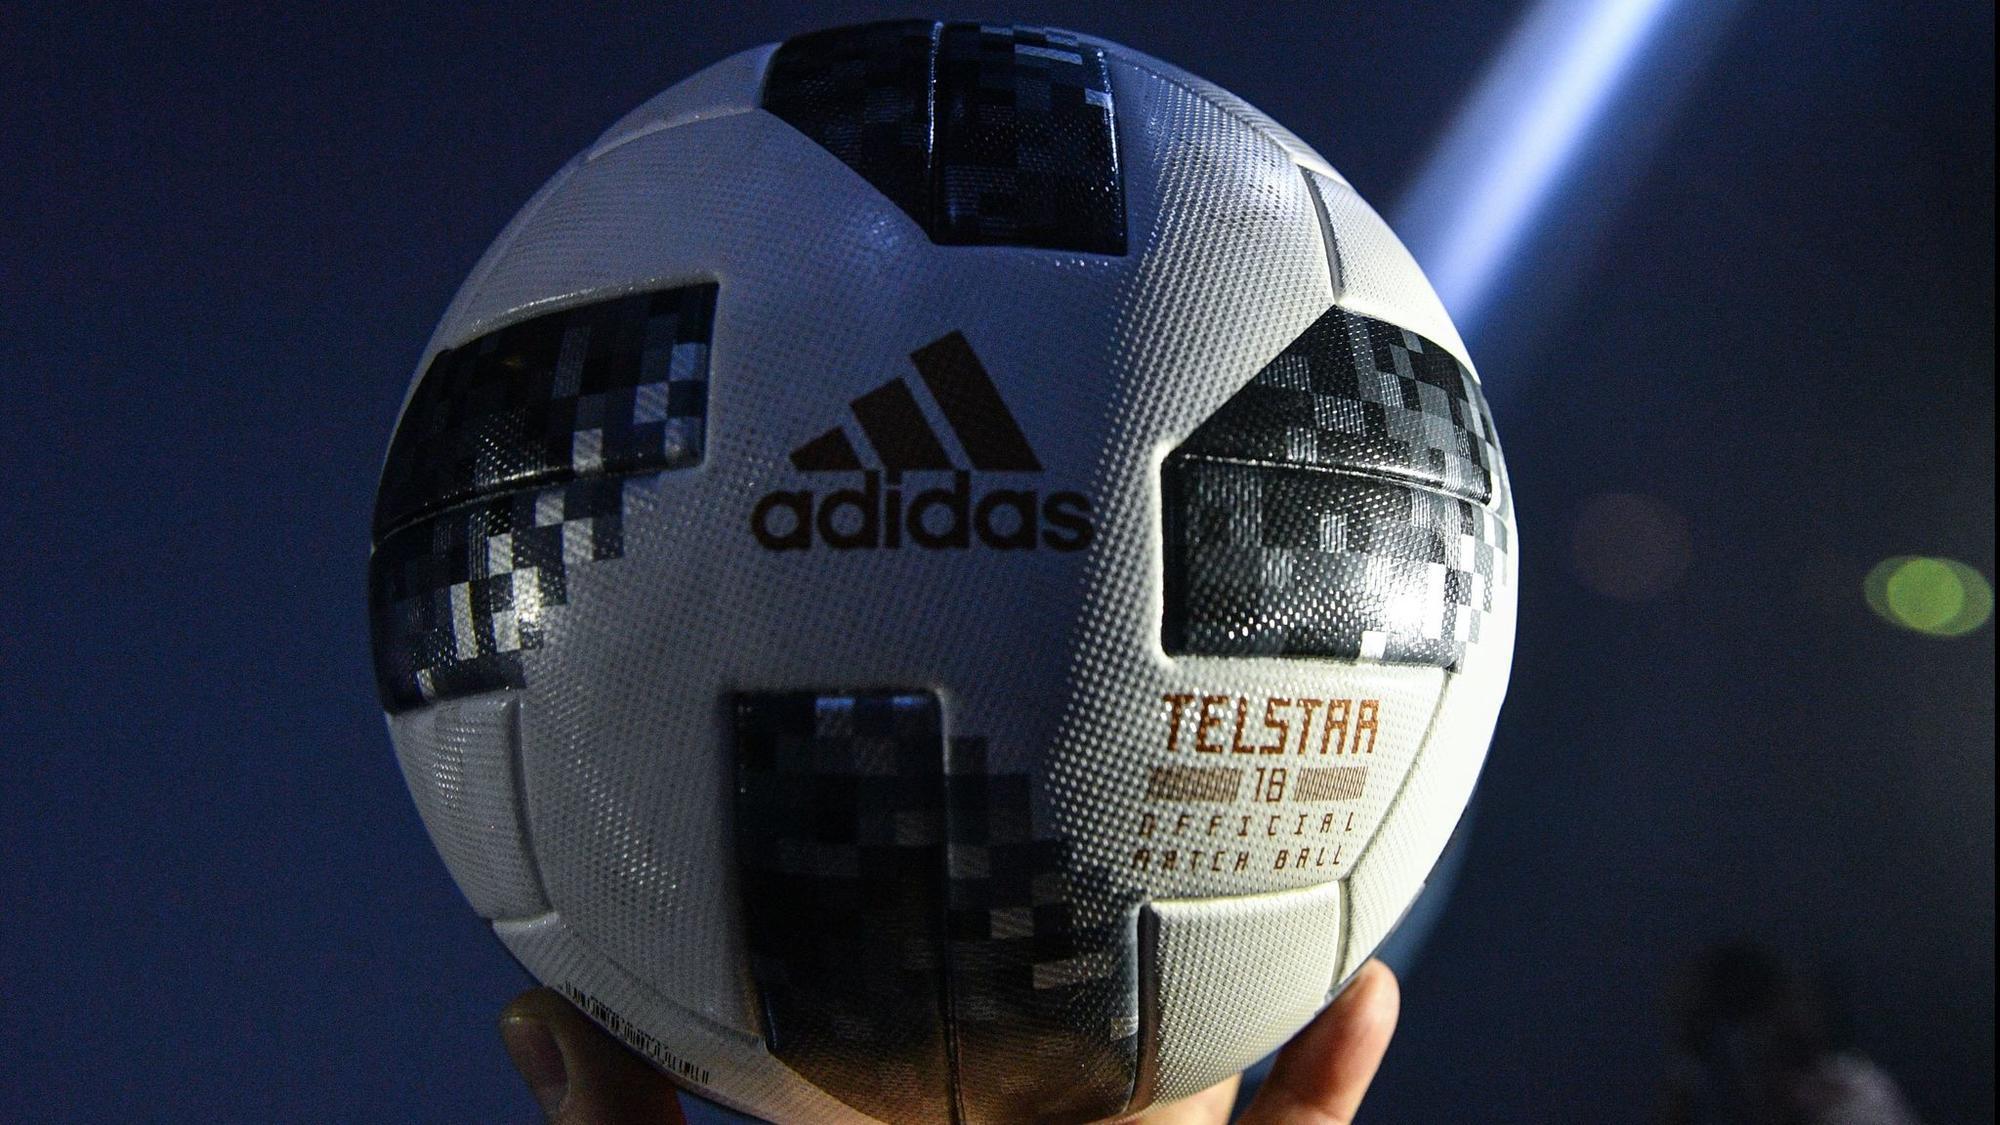 Adidas unveils 2018 World Cup match ball - Chicago Tribune 0061bfa1c